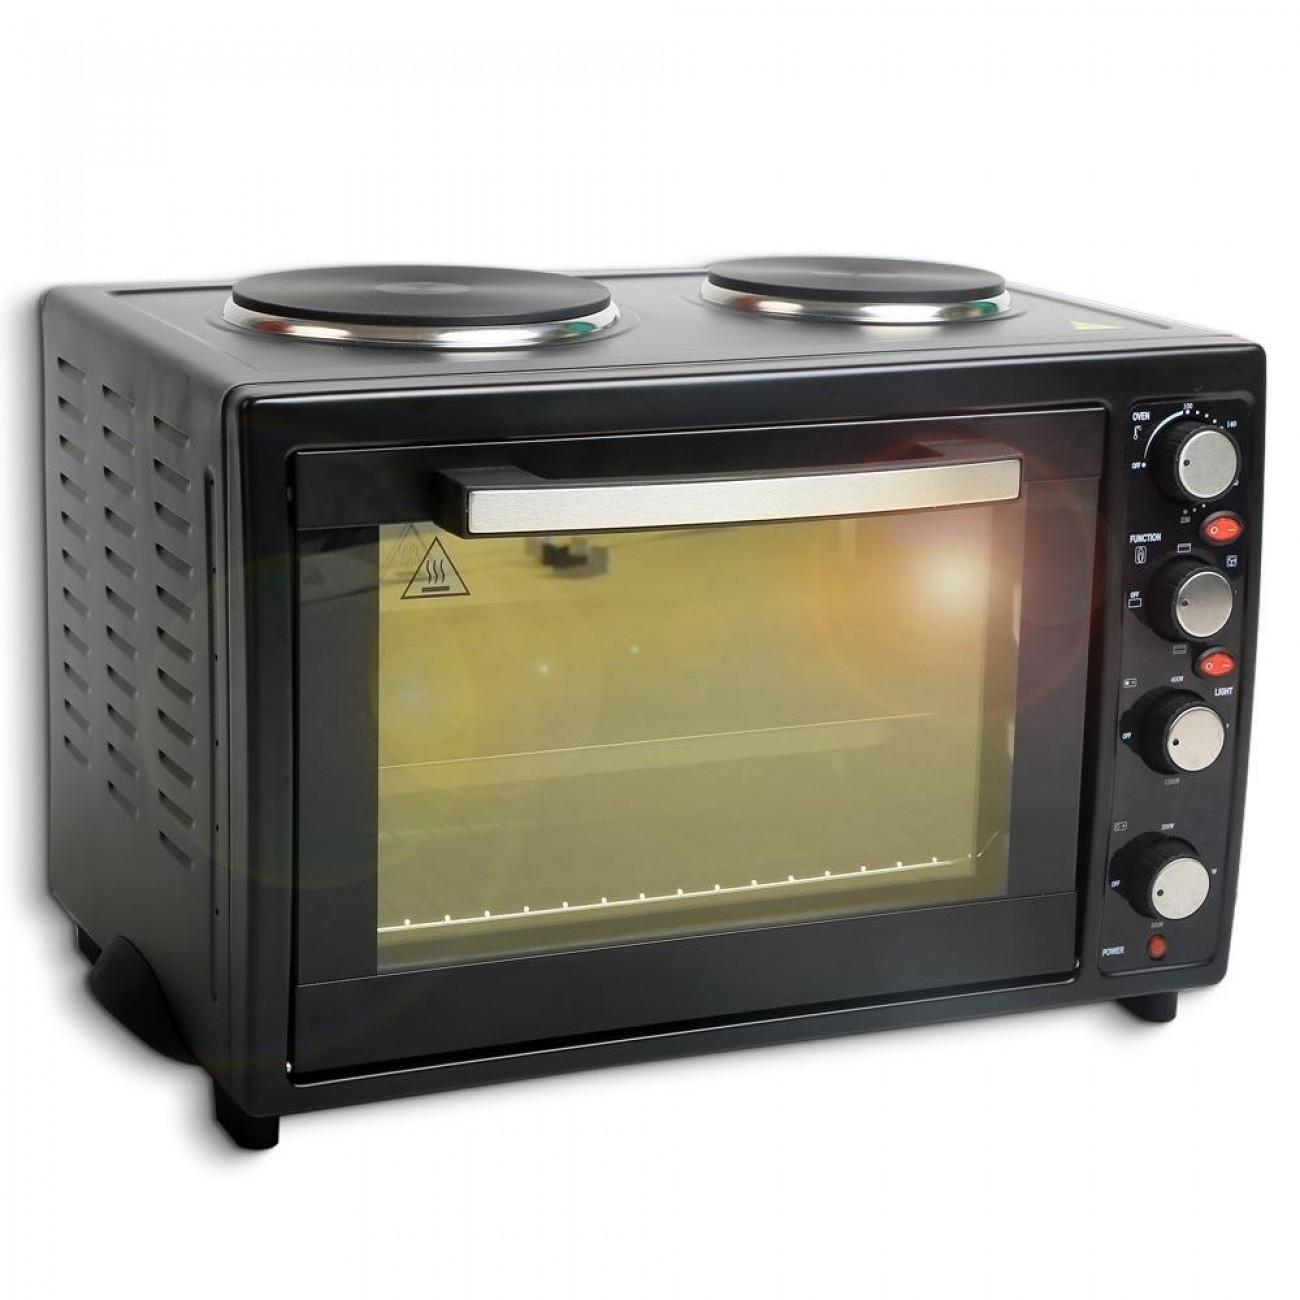 Готварска печка с конвекция ZEPHYR ZP 1441 SLC35, 35 литра, 3300W, Енергиен клас А,  Два котлона, Черен в Готварски печки - ZEPHYR | Alleop